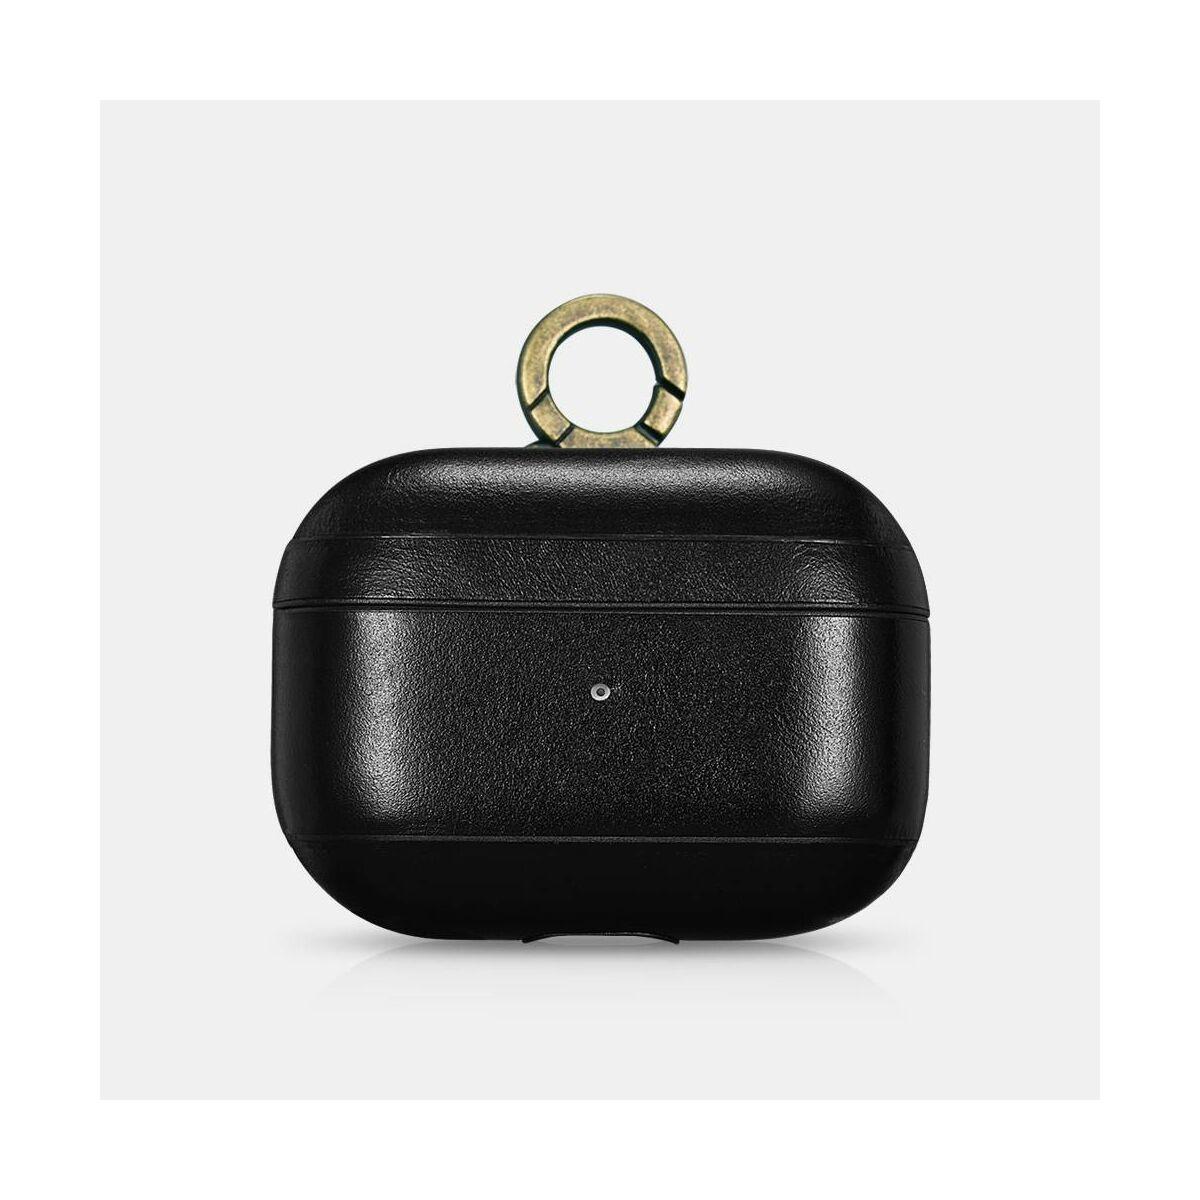 iCarer Apple Airpods Tok, Vintage Bőr (fém kampós akasztóval) fekete